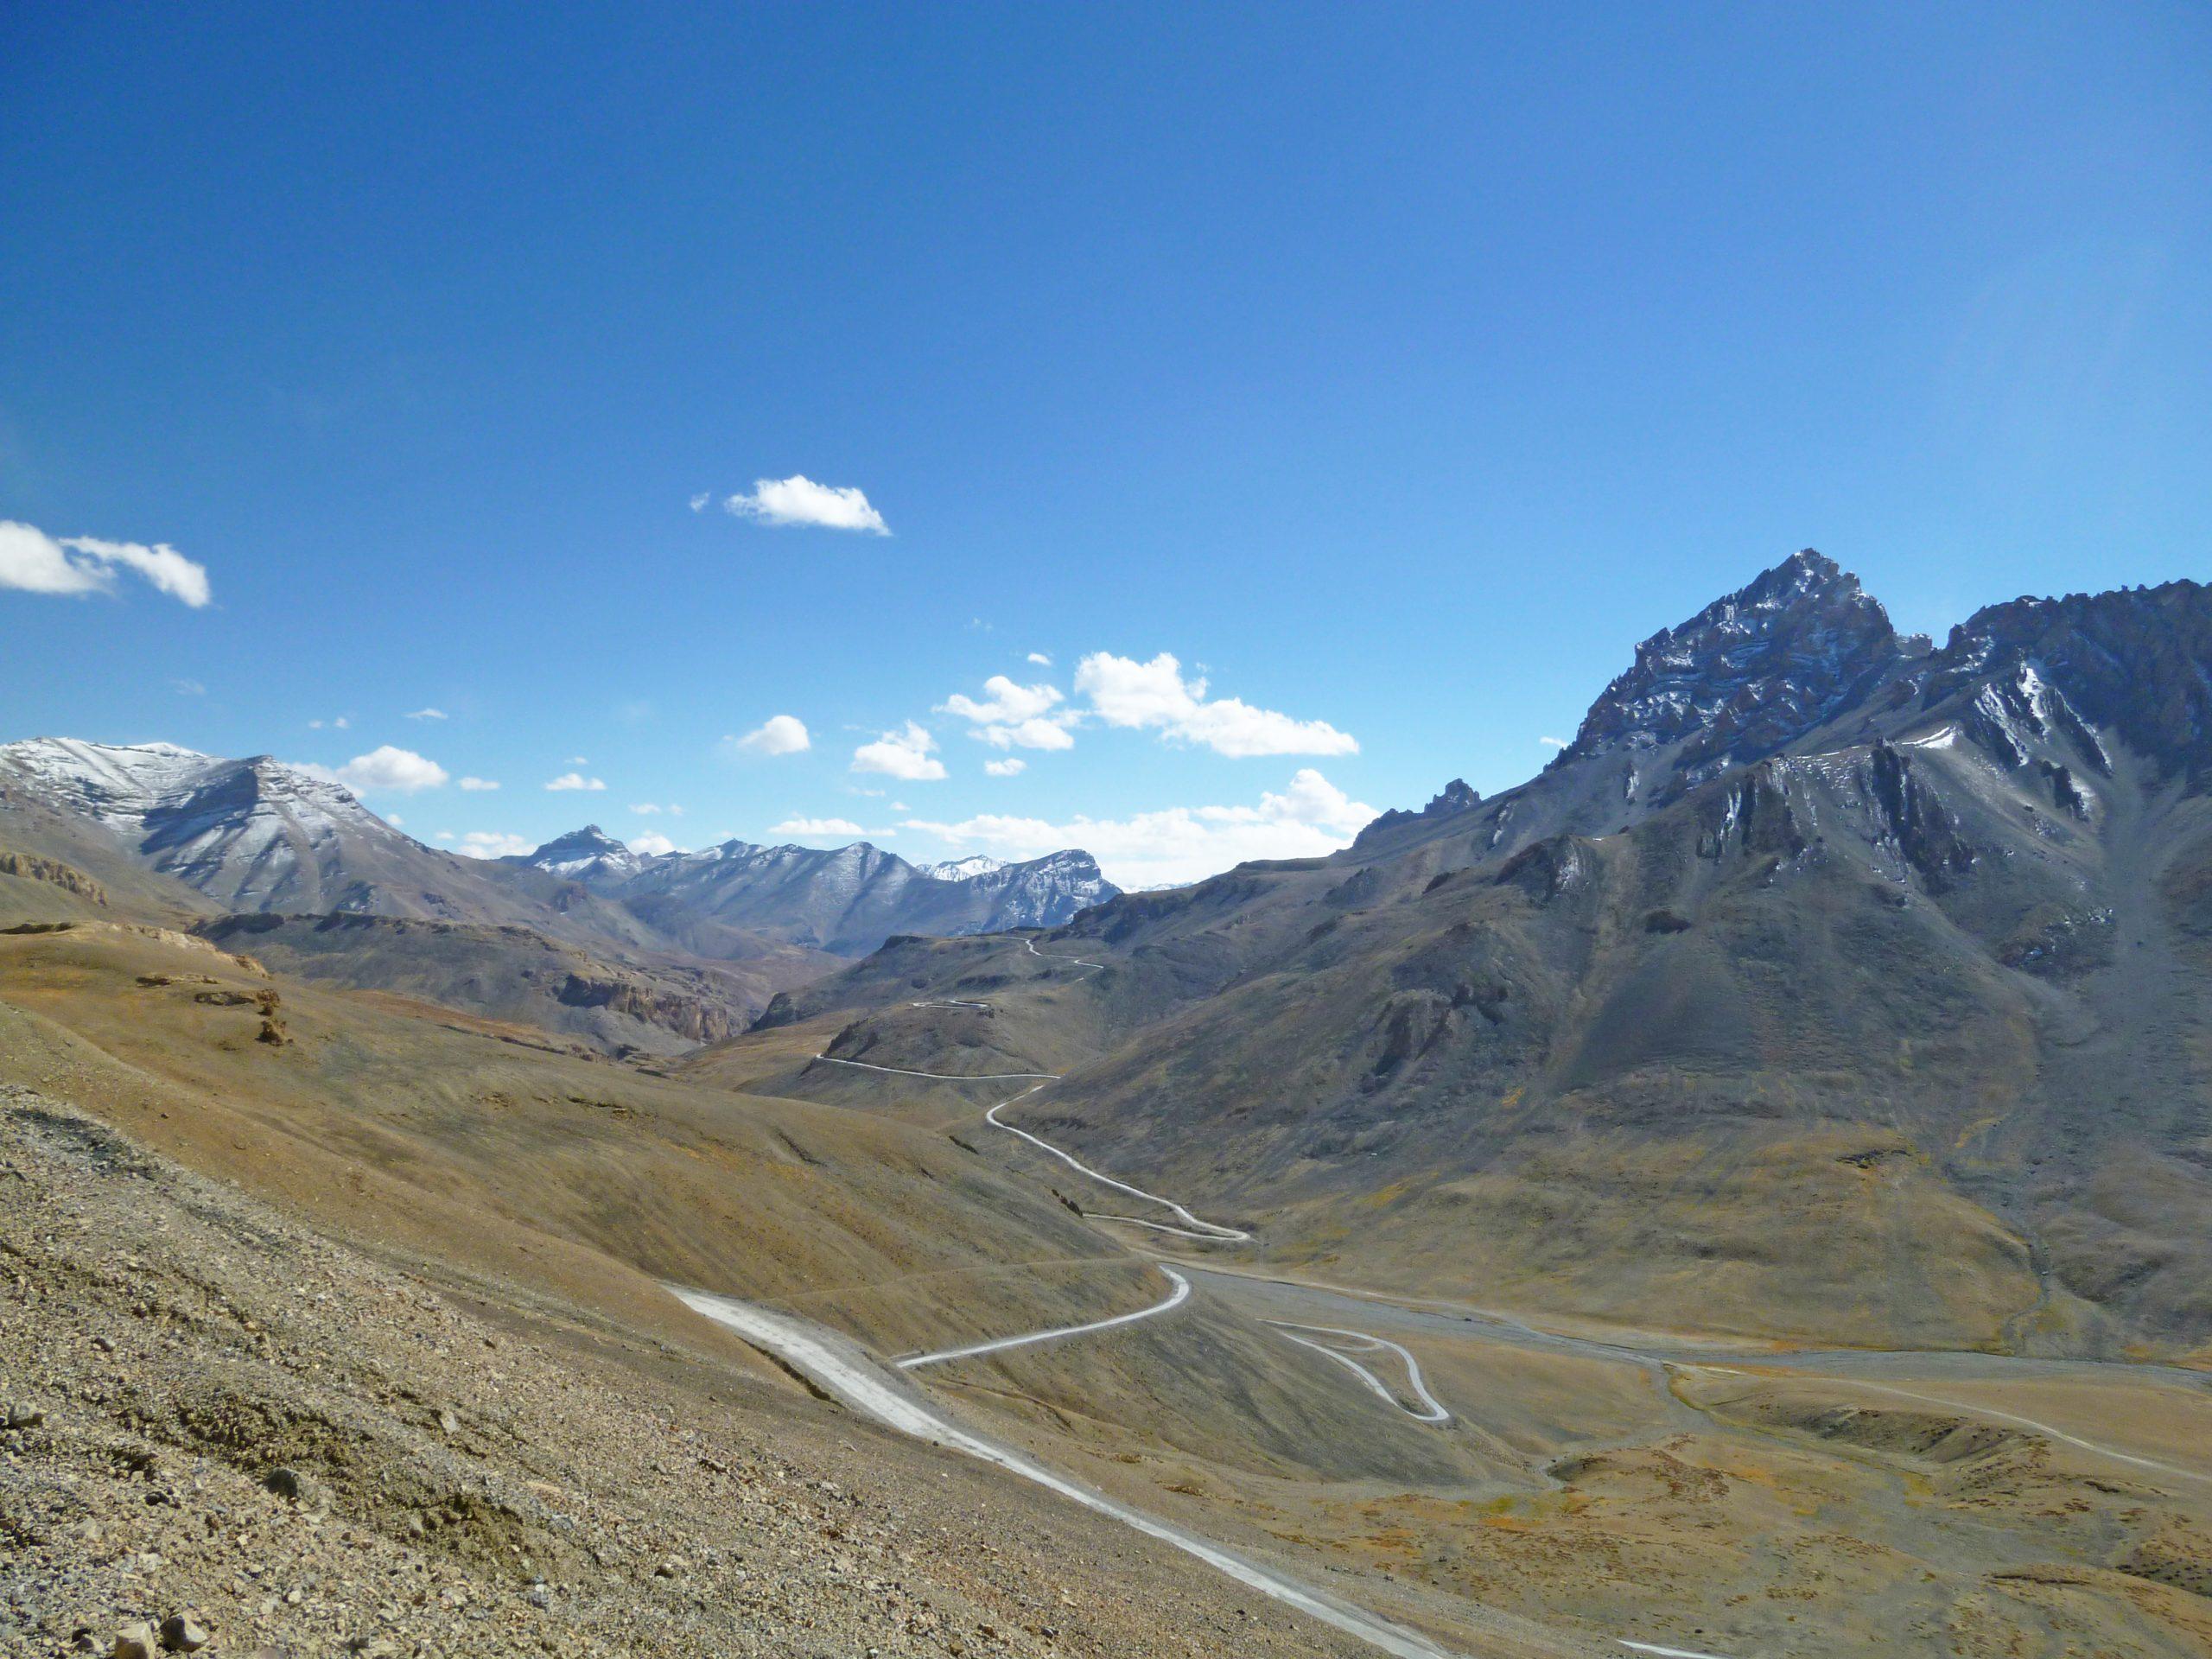 Radreise Ladakh 2012 - Lachulung La und Nakeela